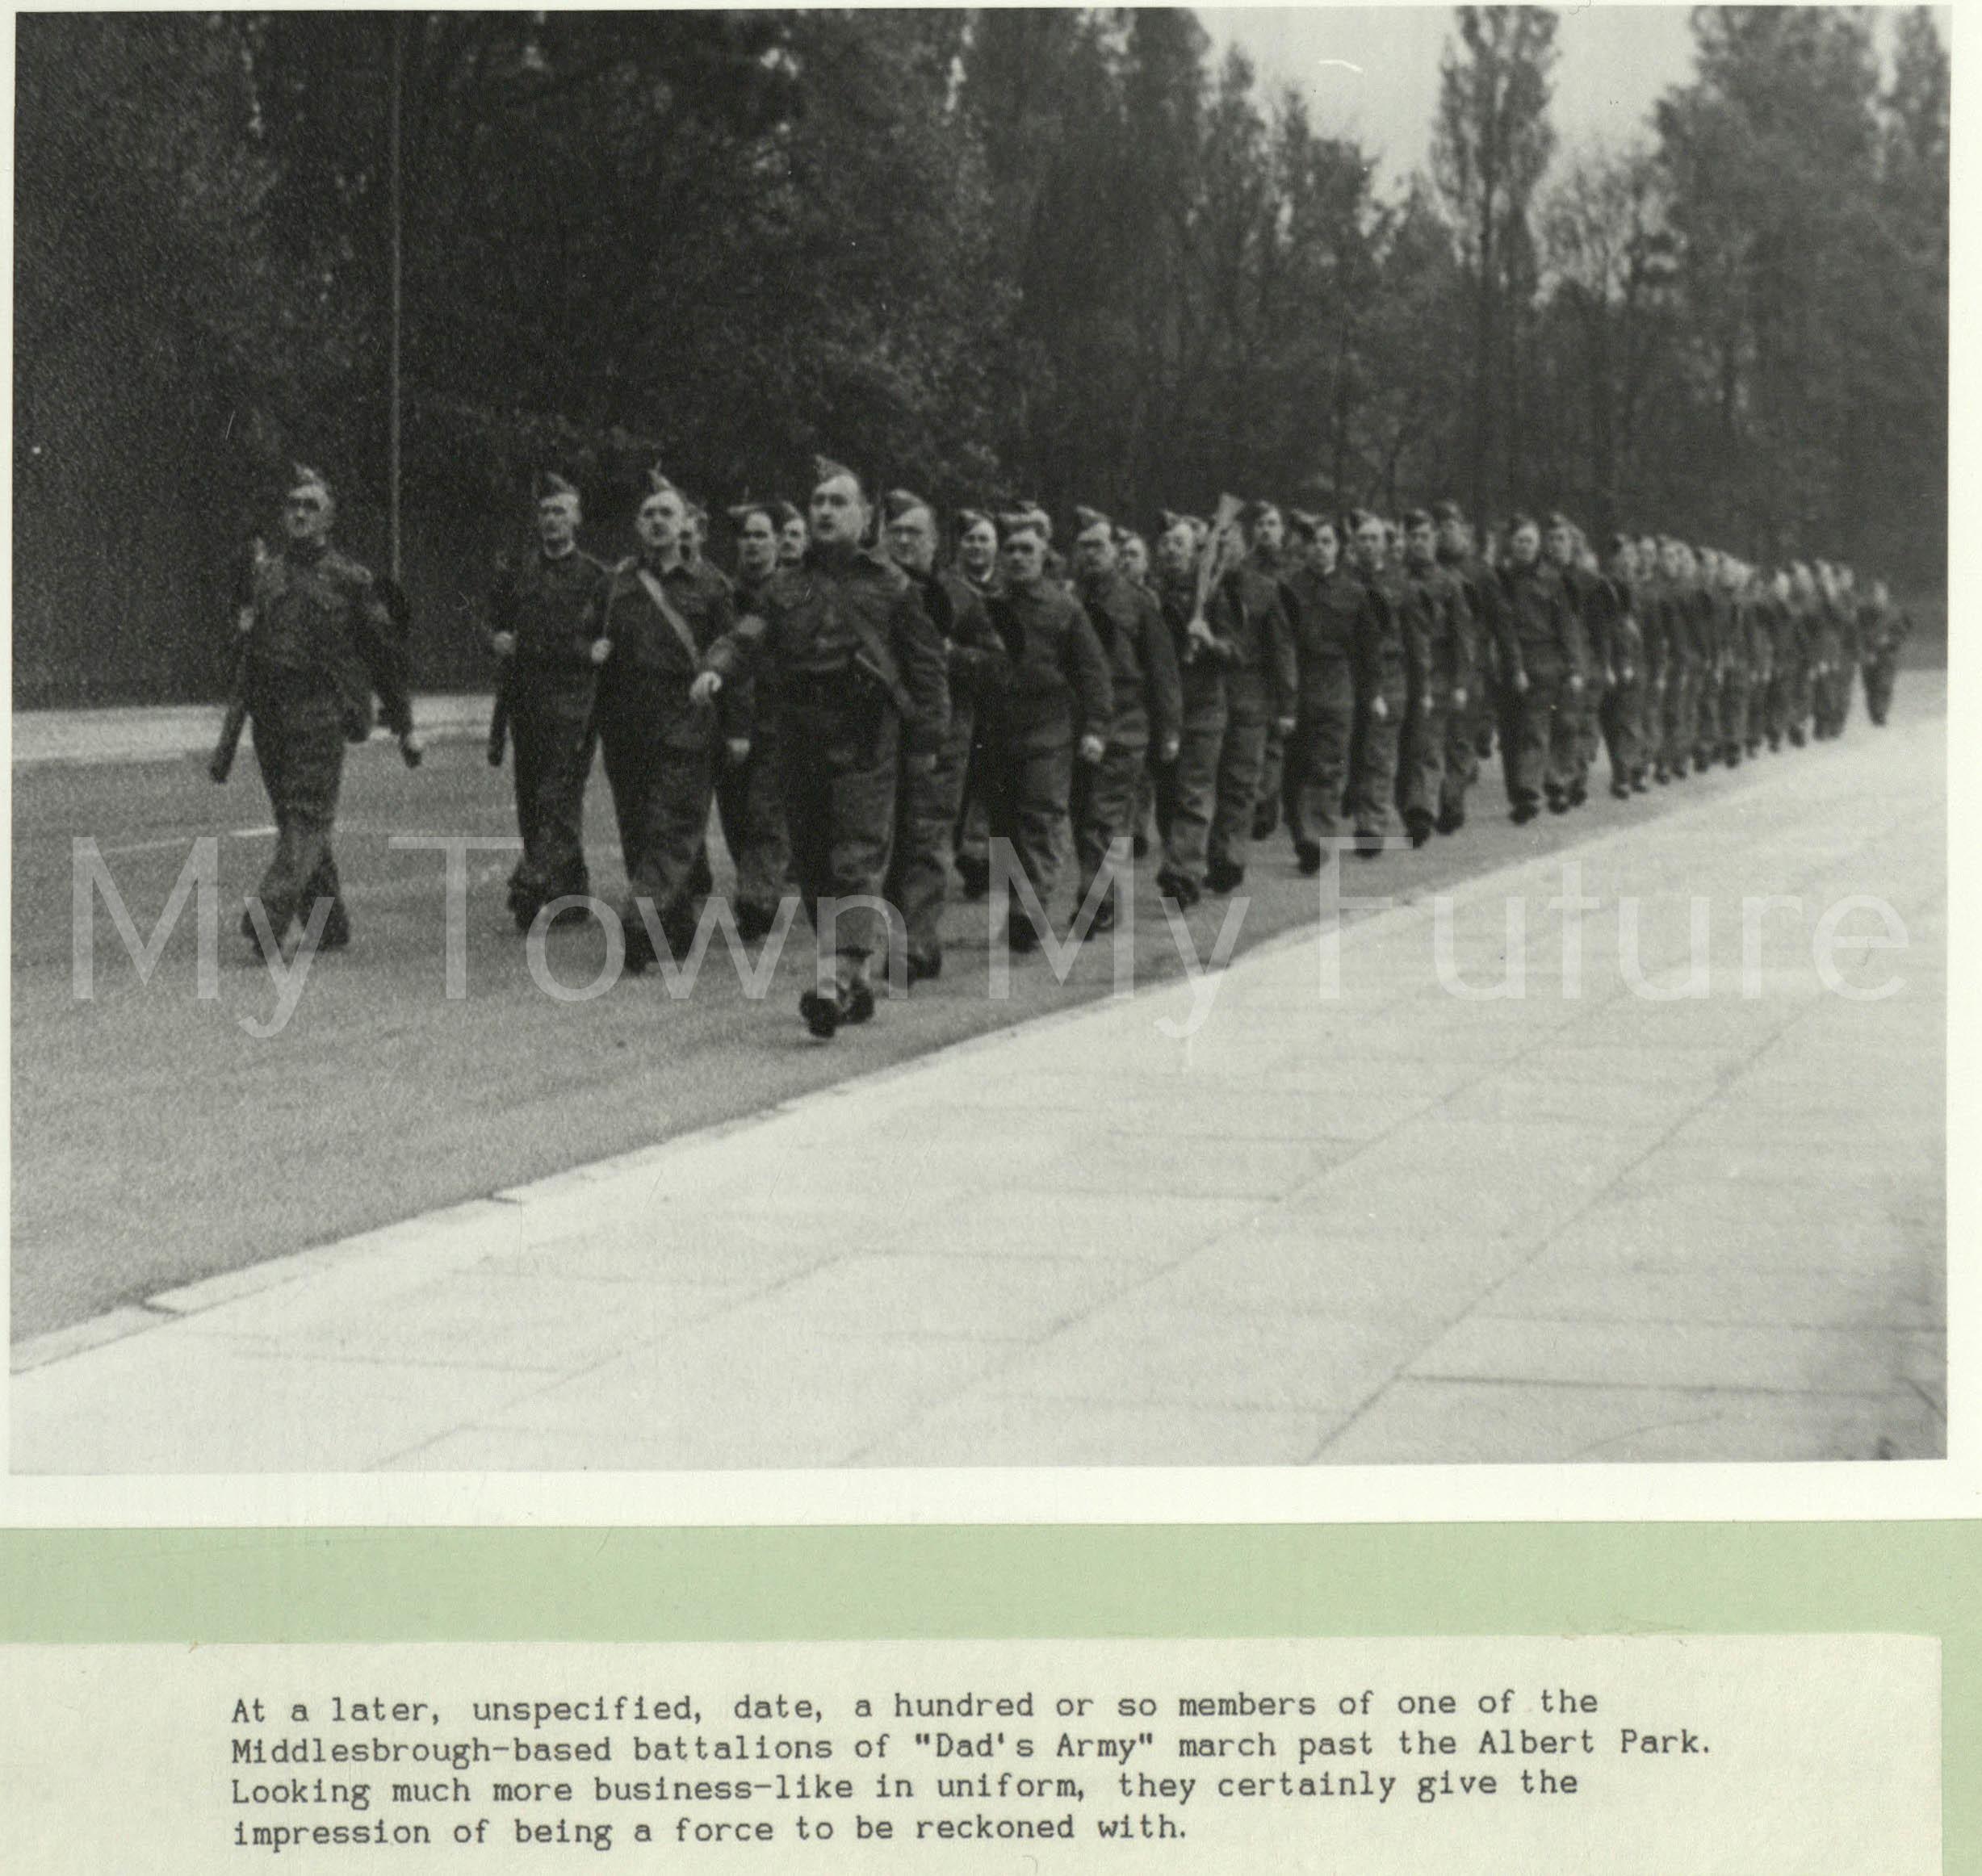 Home Guard - Marching outside Albert Park, Dorman Museum